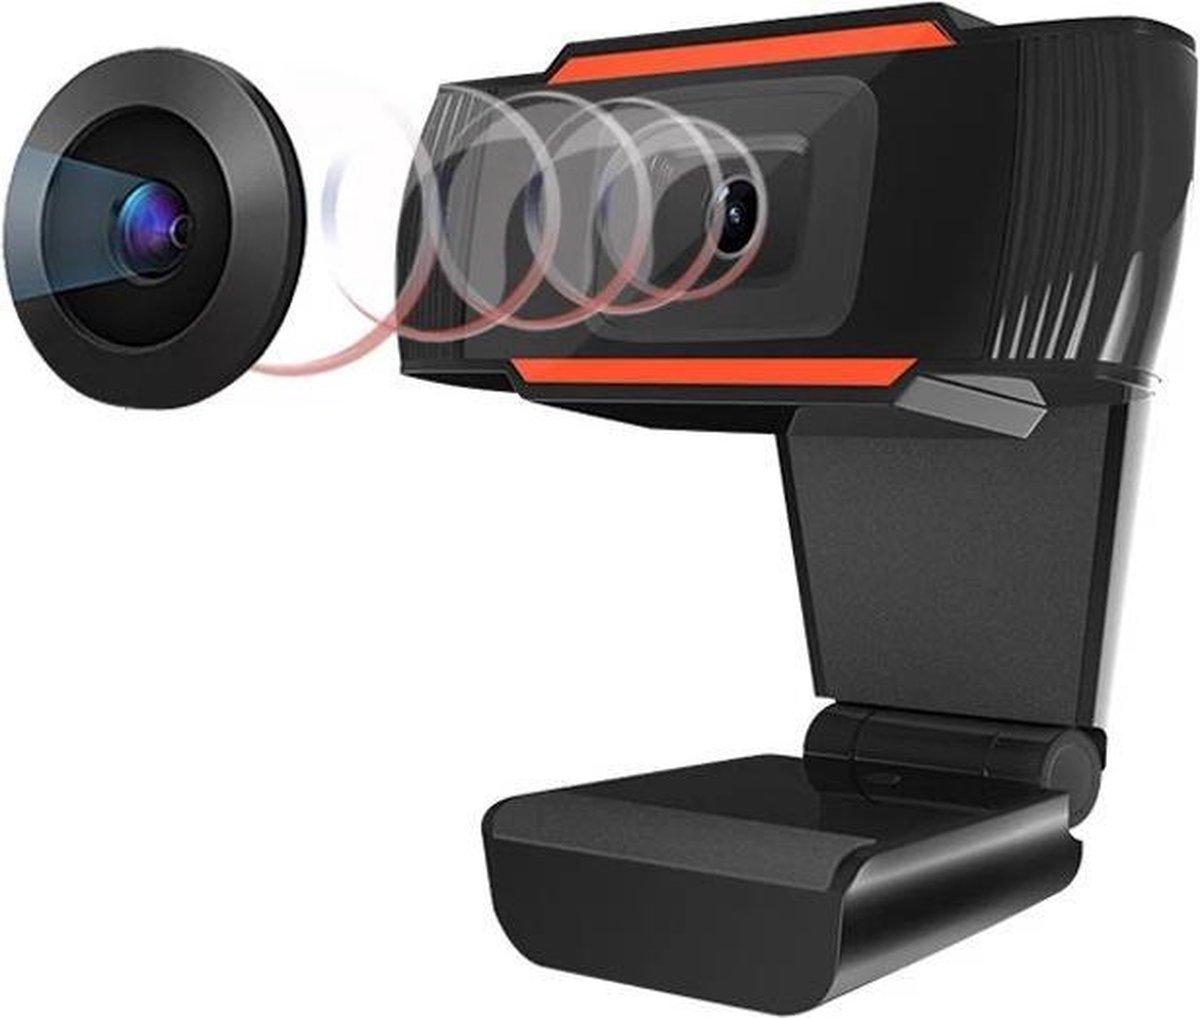 Webcam Full HD- Webcam Full HD 1280P*720P- Webcam voor PC Camera- Usb Webcam- Microfoon Webcam- Webcam Laptop